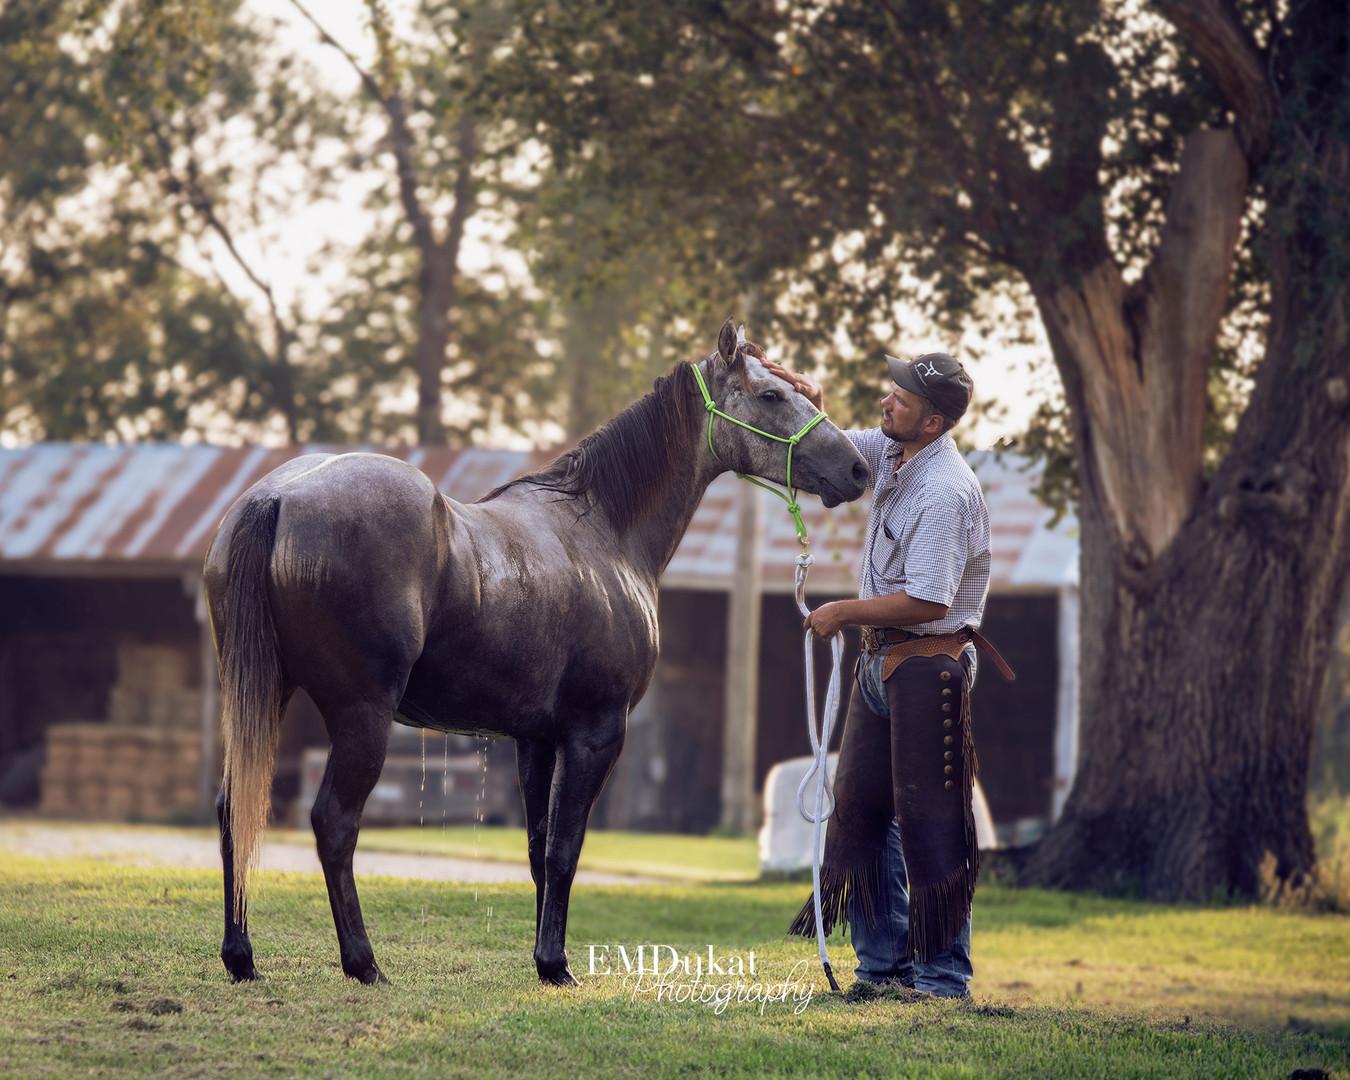 guy-washing-horse-gelding-nebraska-city-equine-photographer